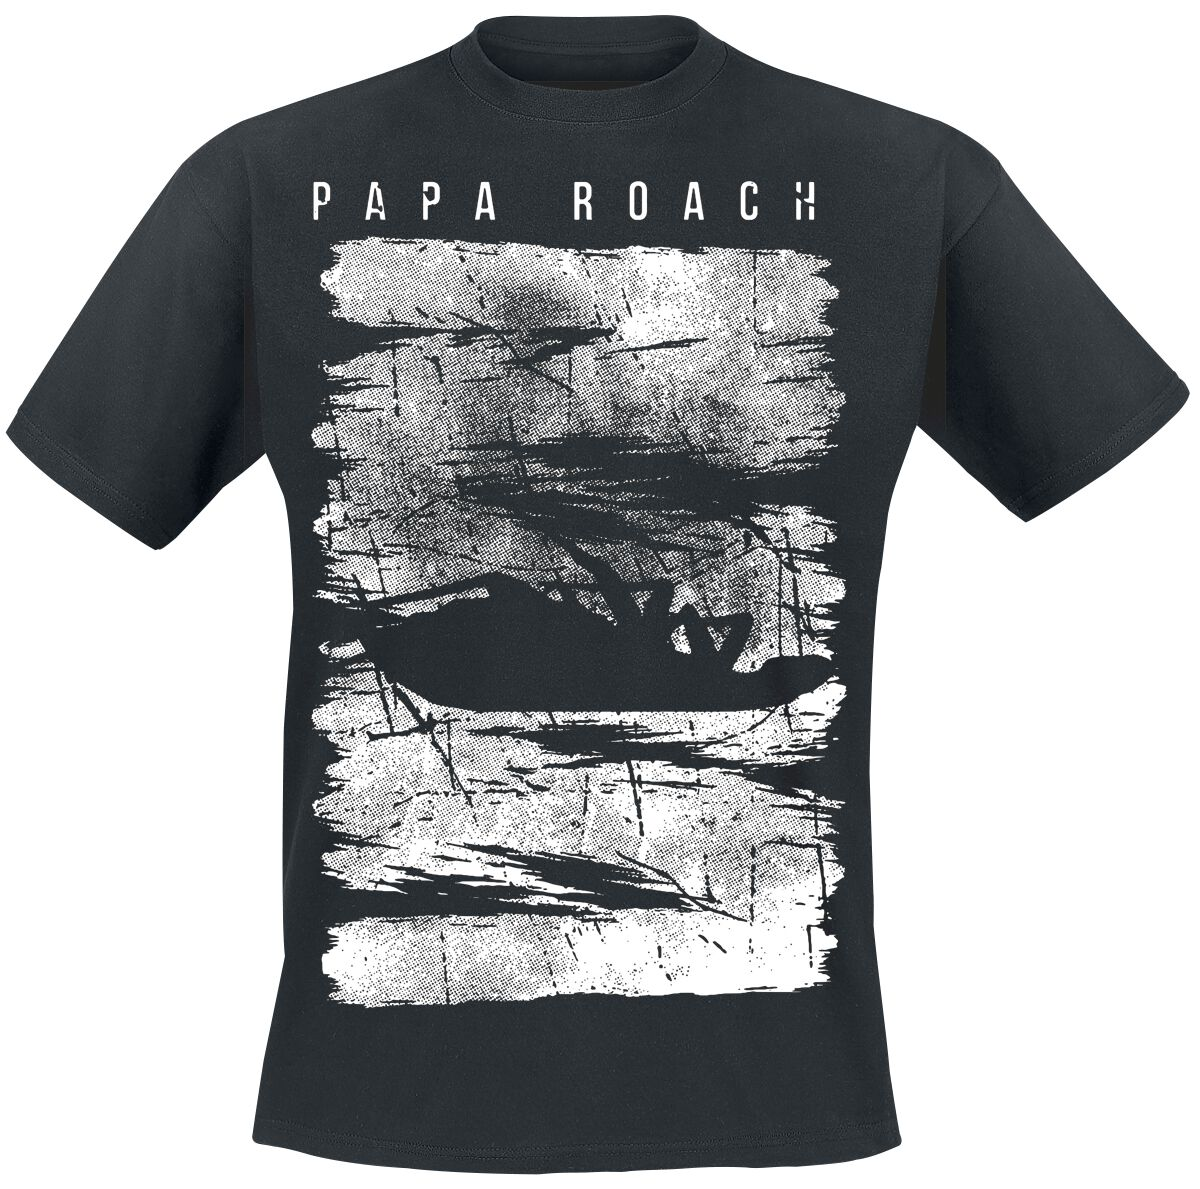 Zespoły - Koszulki - T-Shirt Papa Roach Distress T-Shirt czarny - 354354